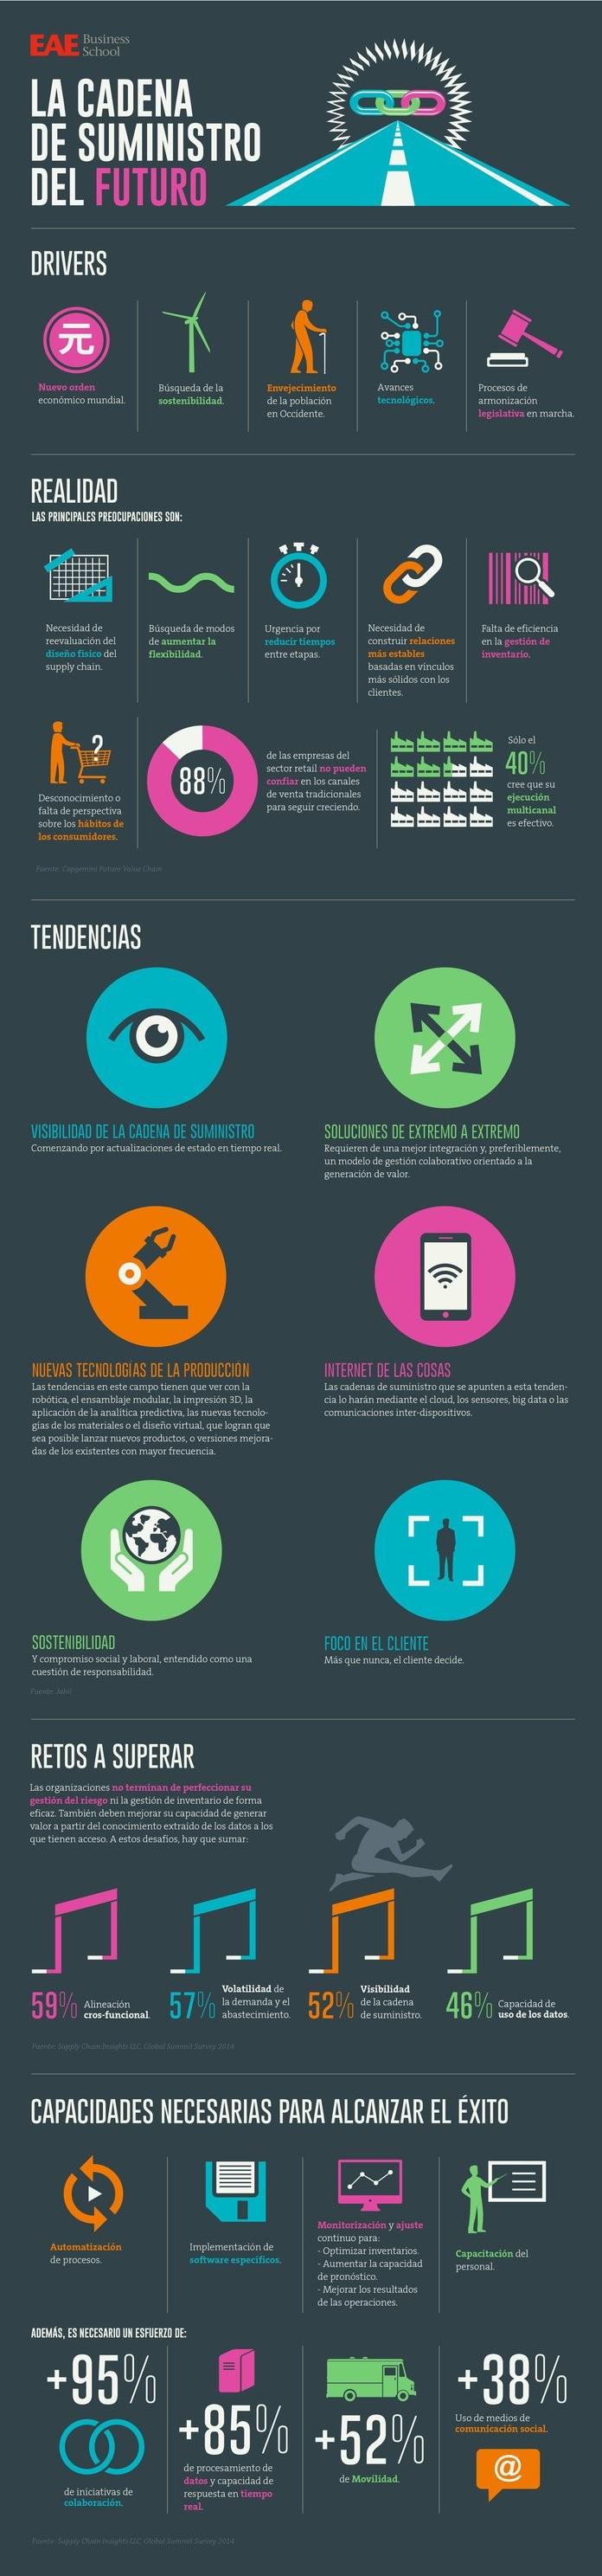 Infografia Tendencias futuro cadena de suministro